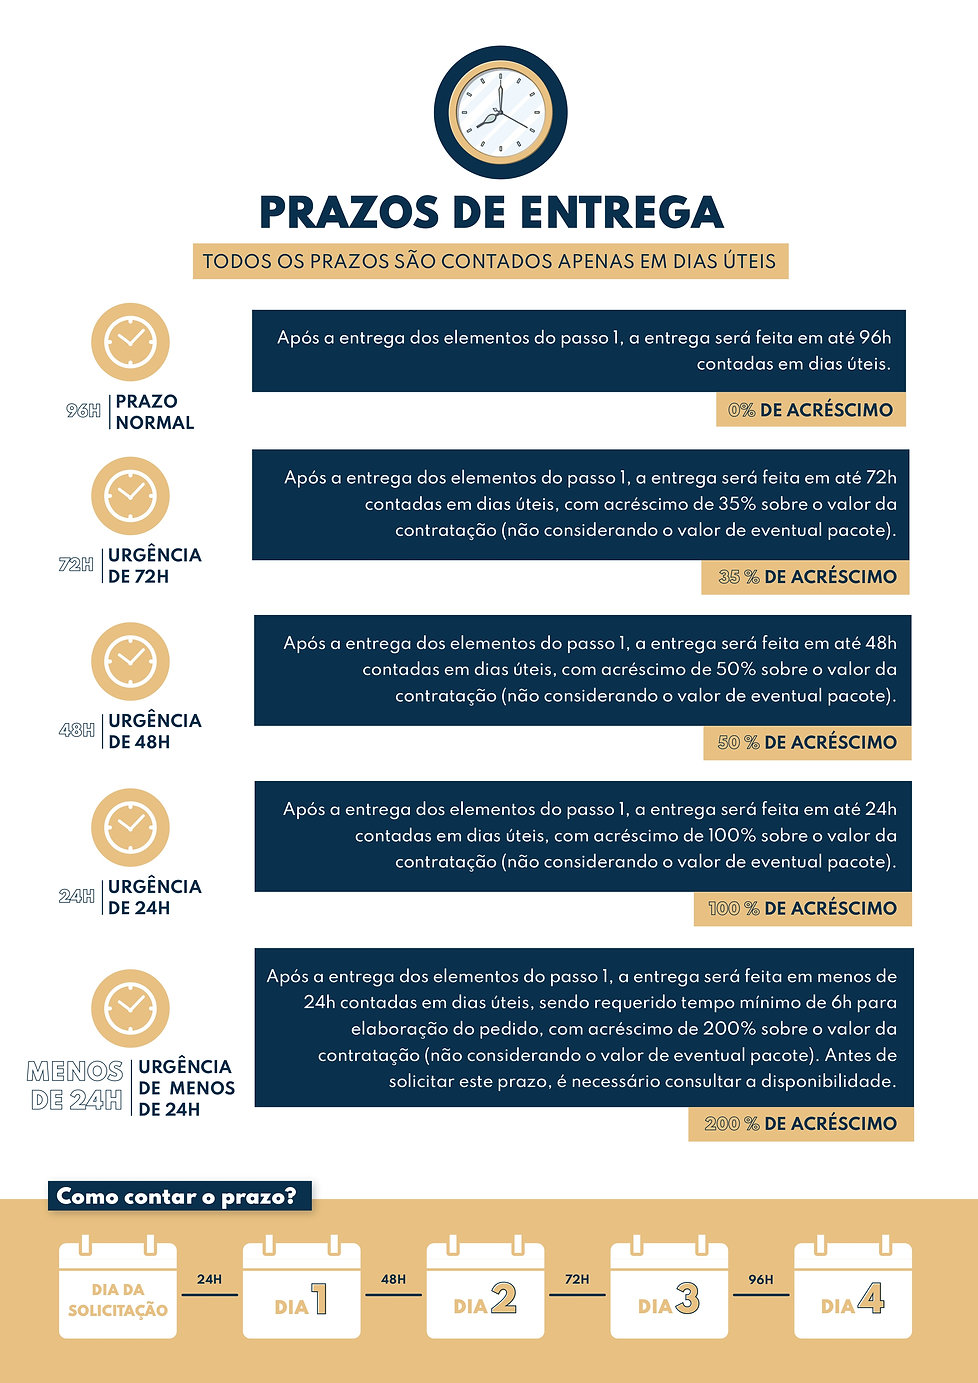 # CATÁLOGO IURIS PETIÇÕES_page-0004.jpg